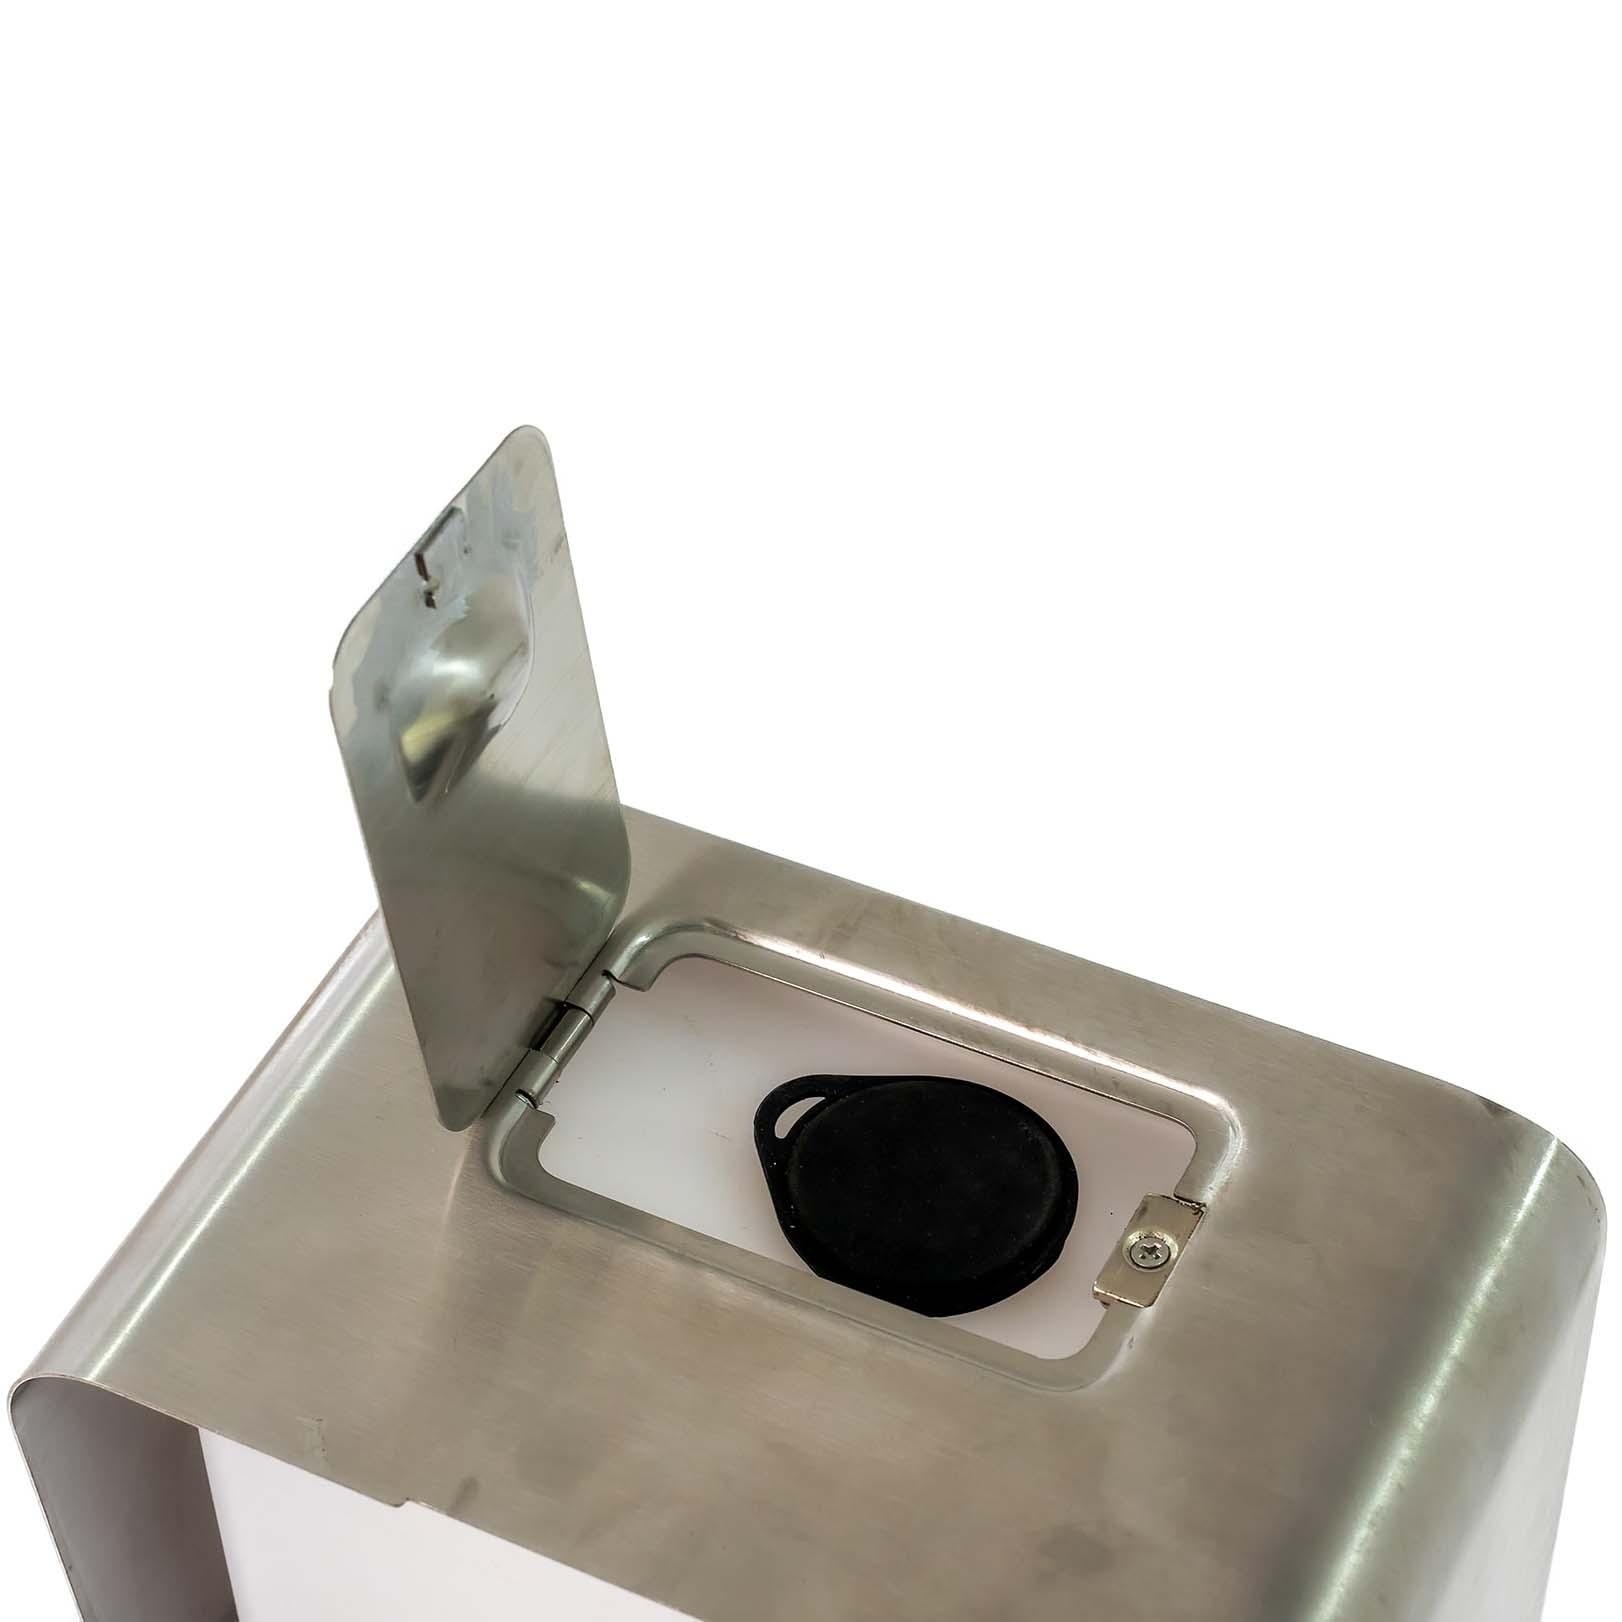 SANIC Edelstahl Desinfektionssäule mit Sensor